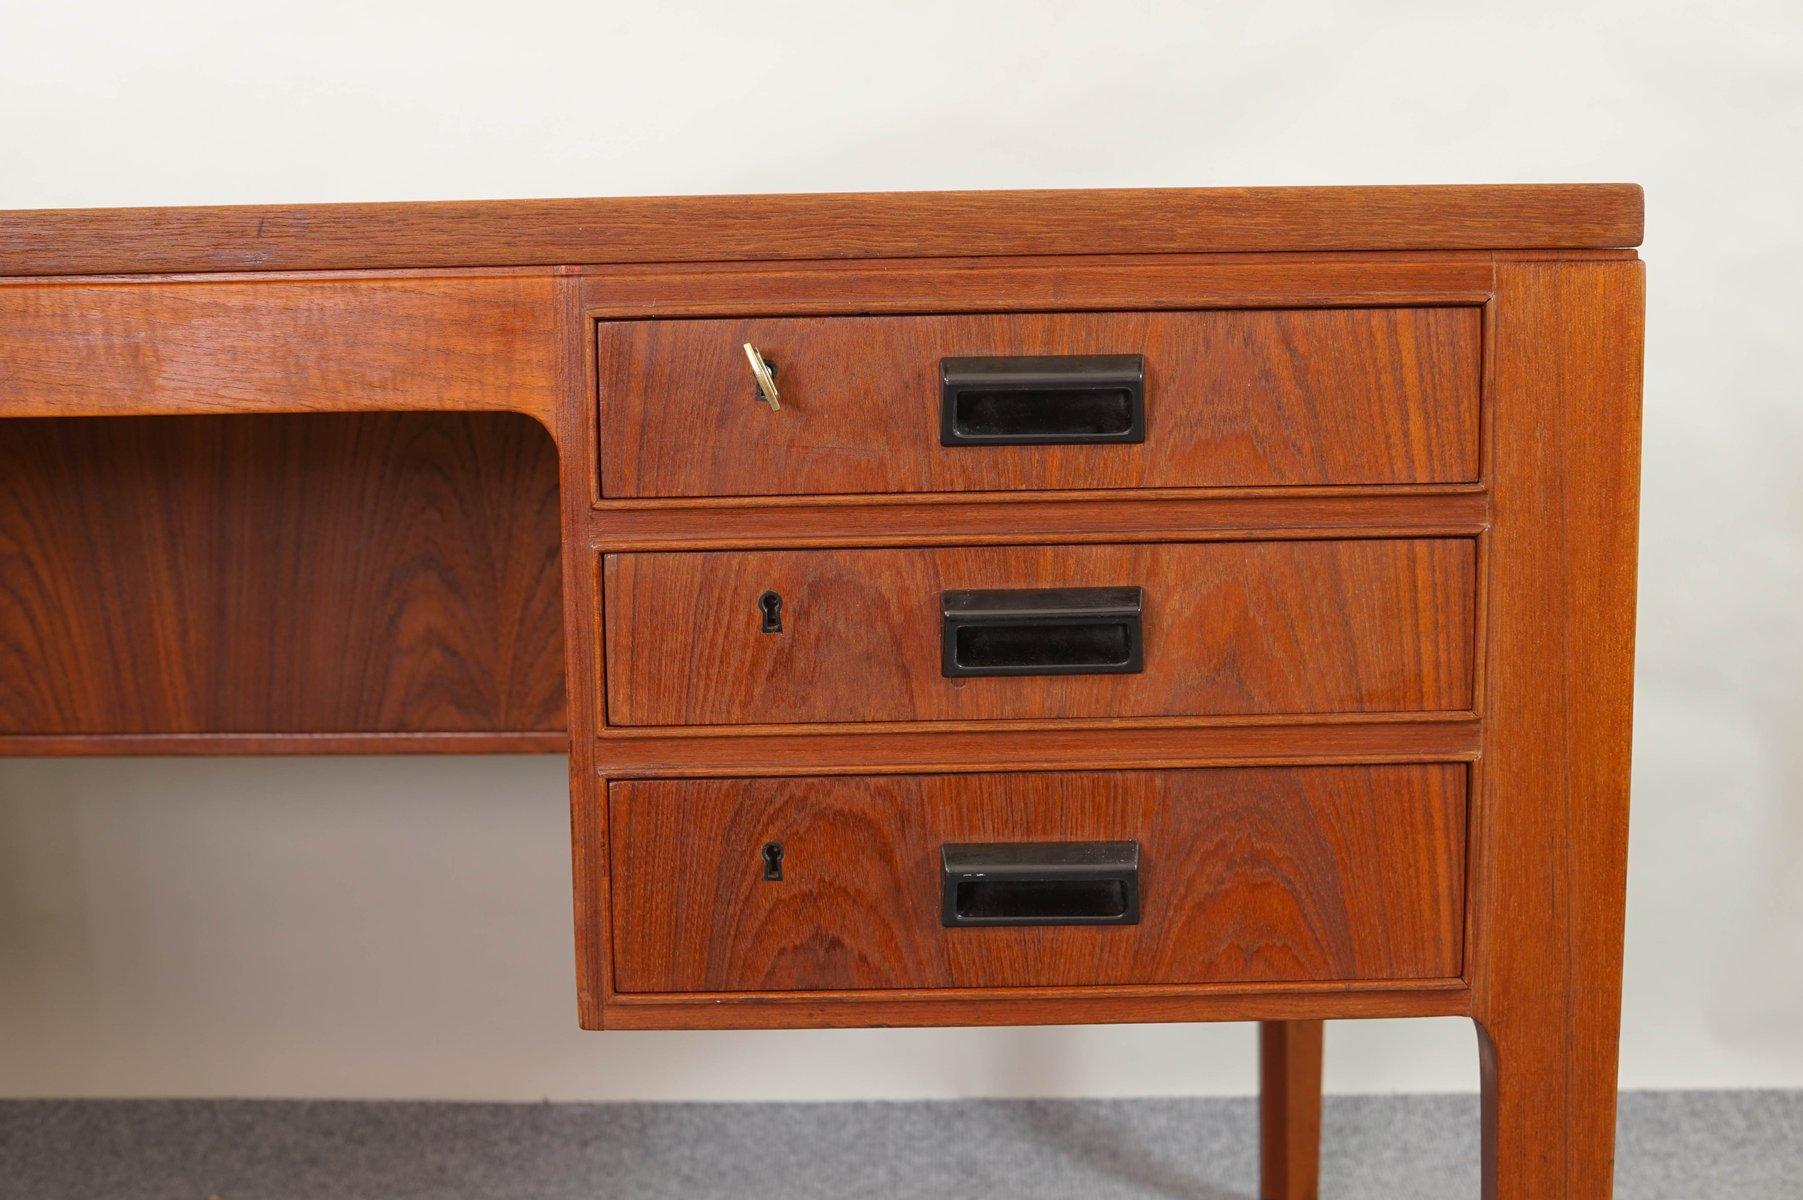 bureau en teck danemark 1950s en vente sur pamono. Black Bedroom Furniture Sets. Home Design Ideas